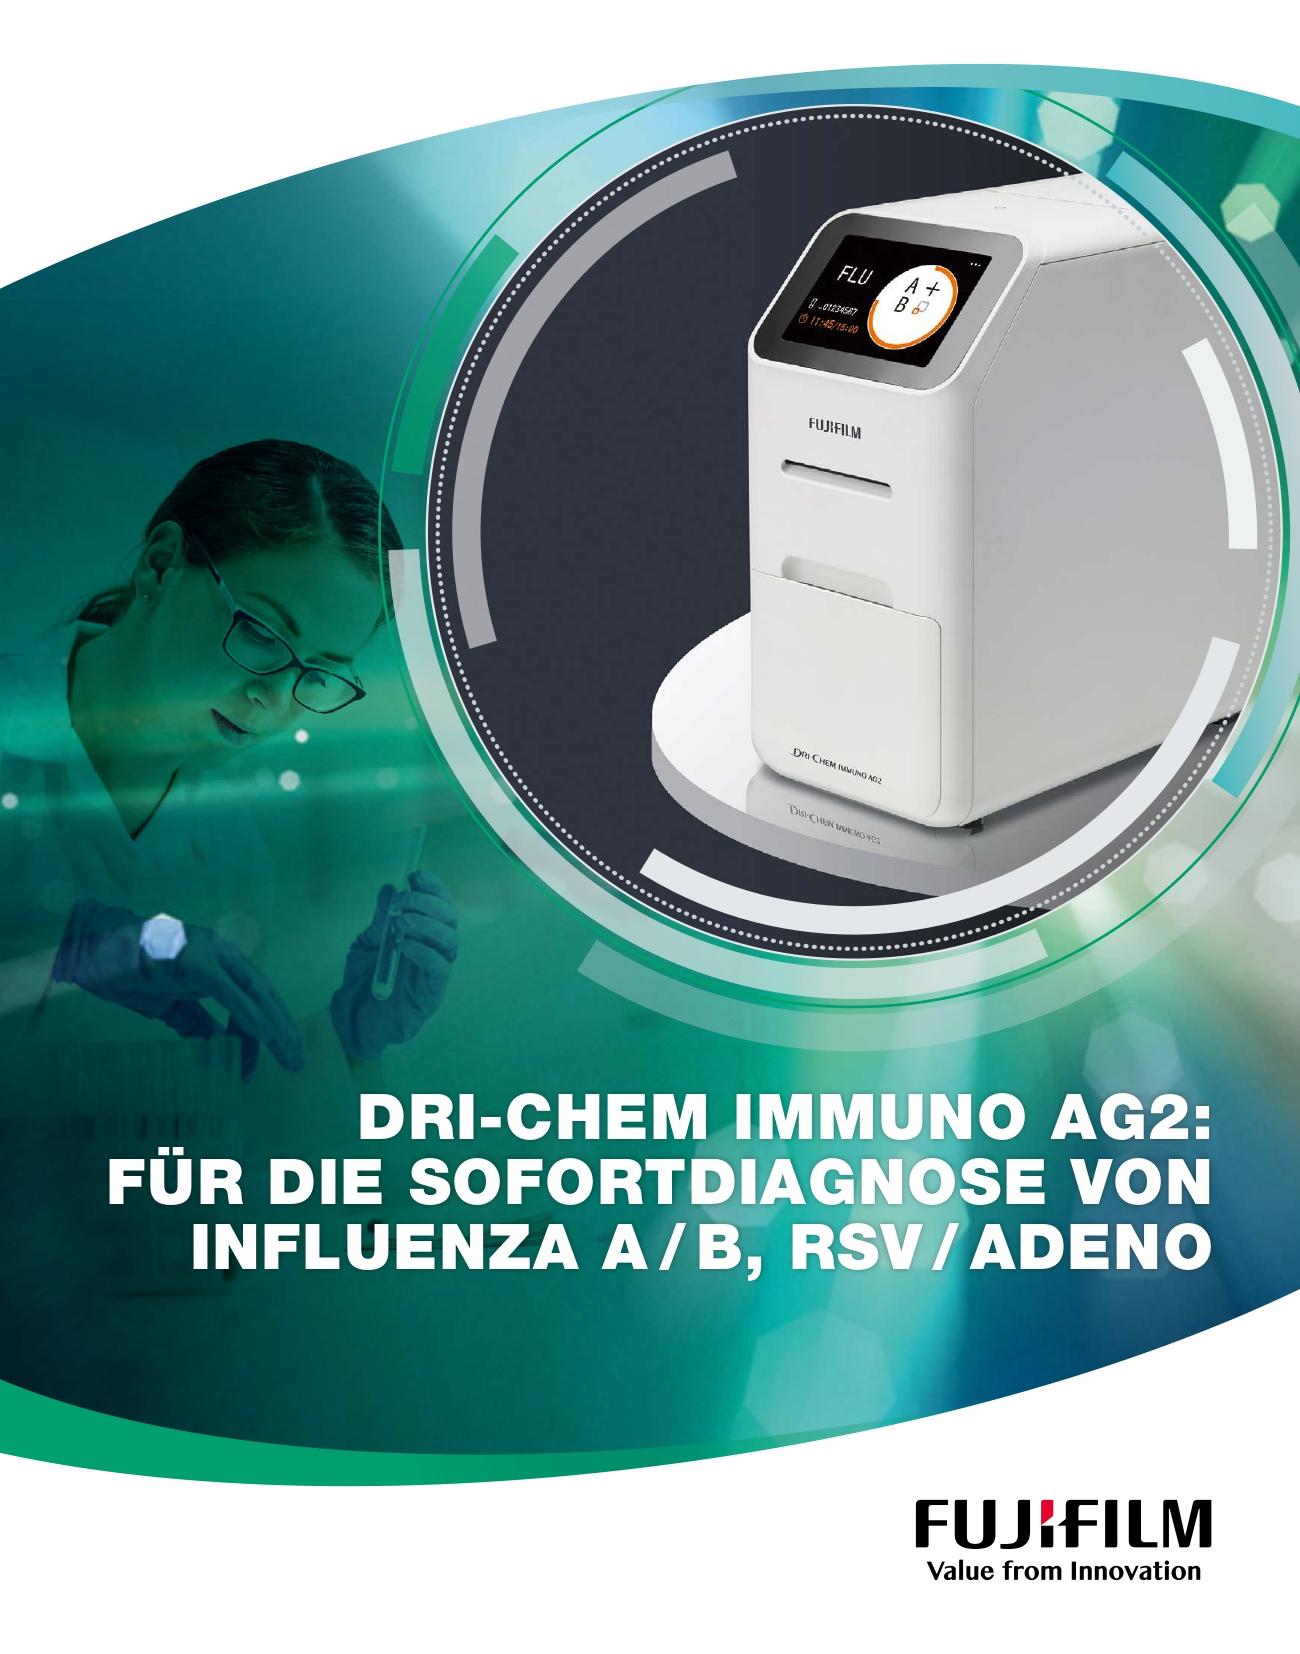 [Foto] FUJIFILM DRI-CHEM IMMUNO AG2 Cover brochure